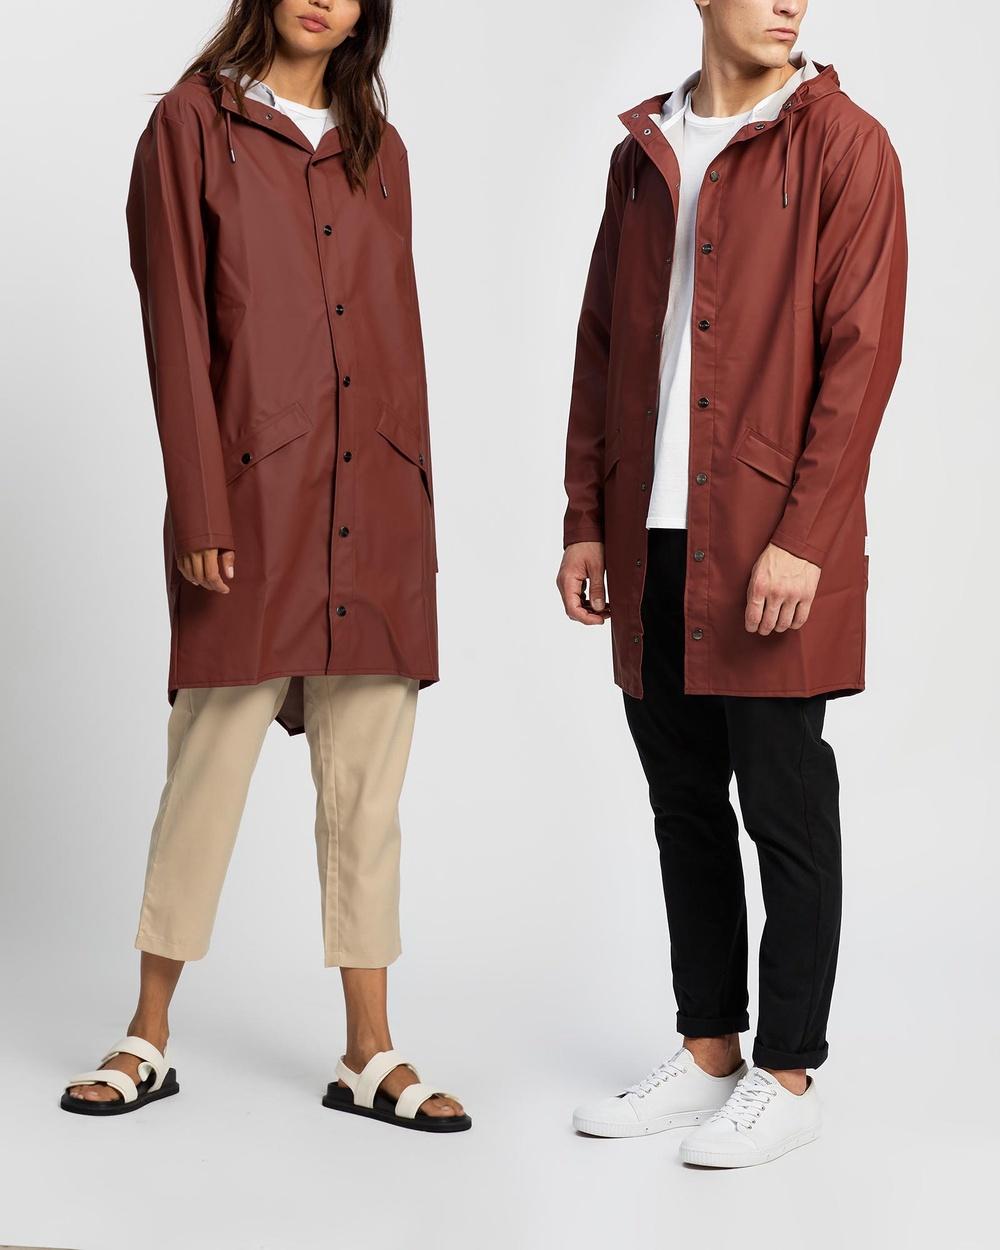 RAINS Long Jacket Coats & Jackets Maroon